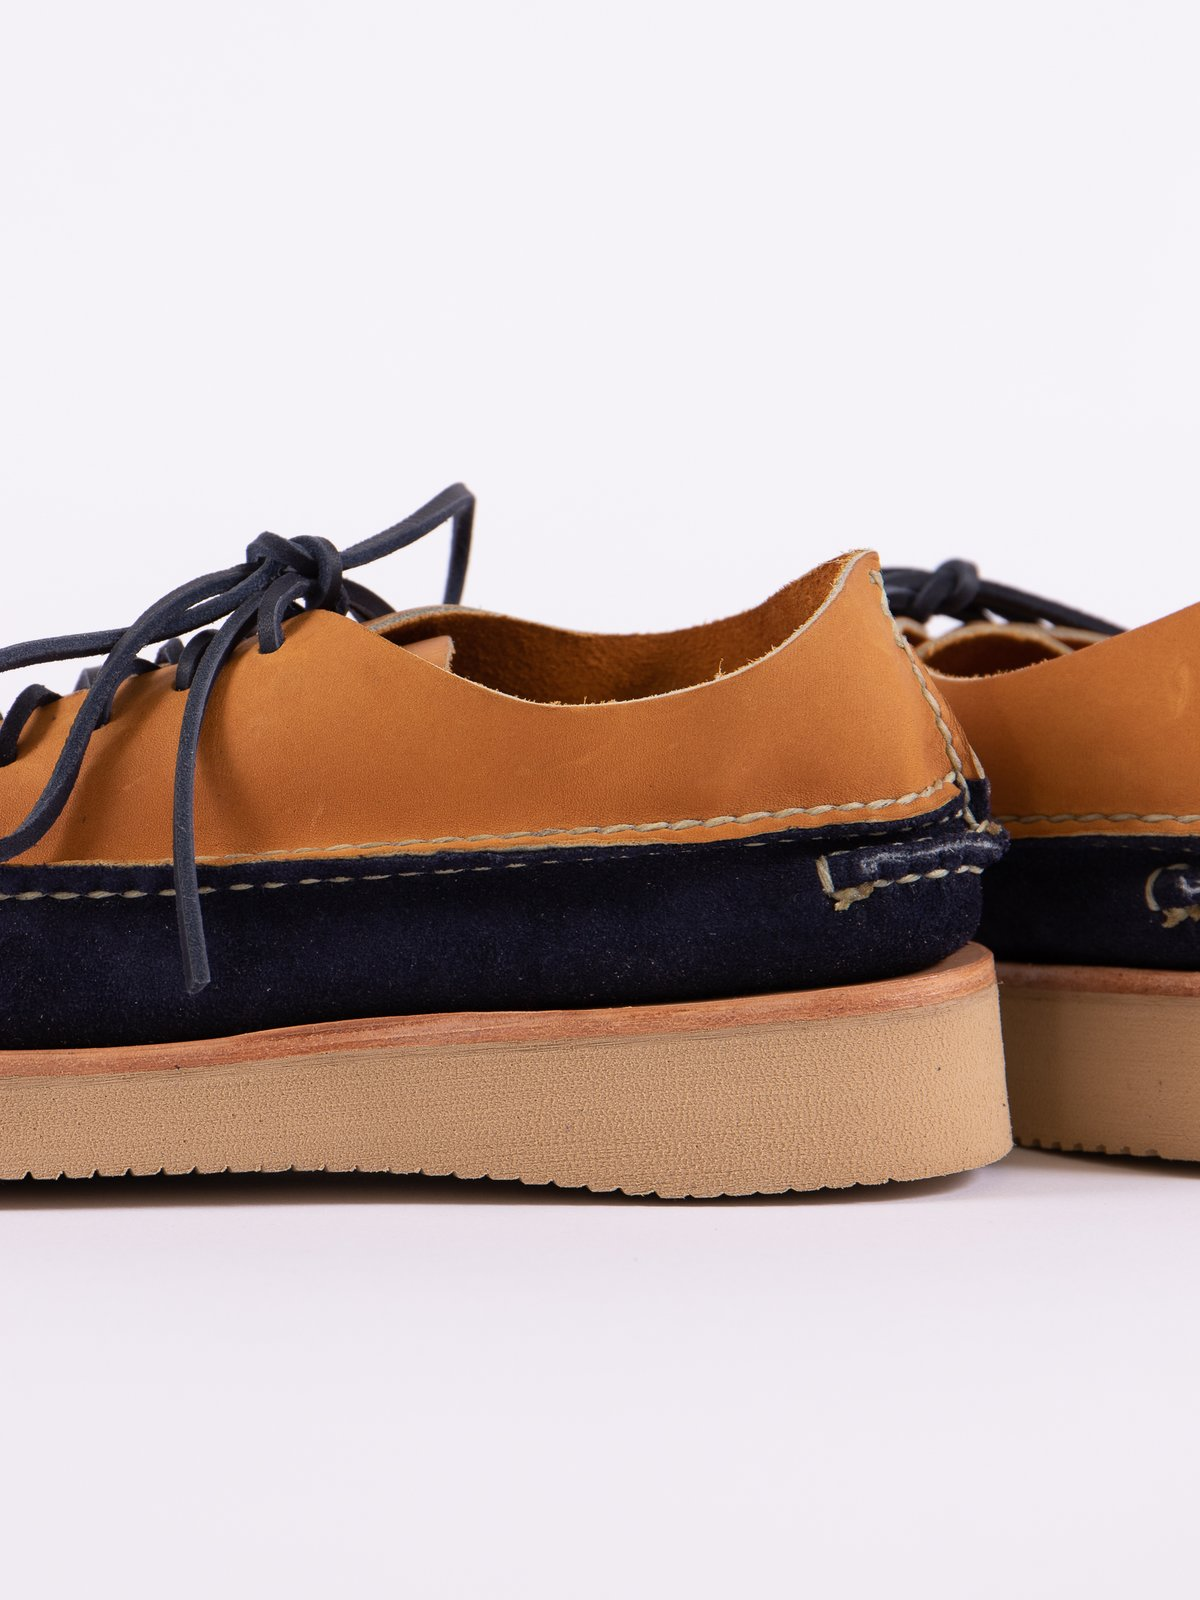 Indigo/Tan All Handsewn Sneaker Moc Ox Exclusive - Image 4